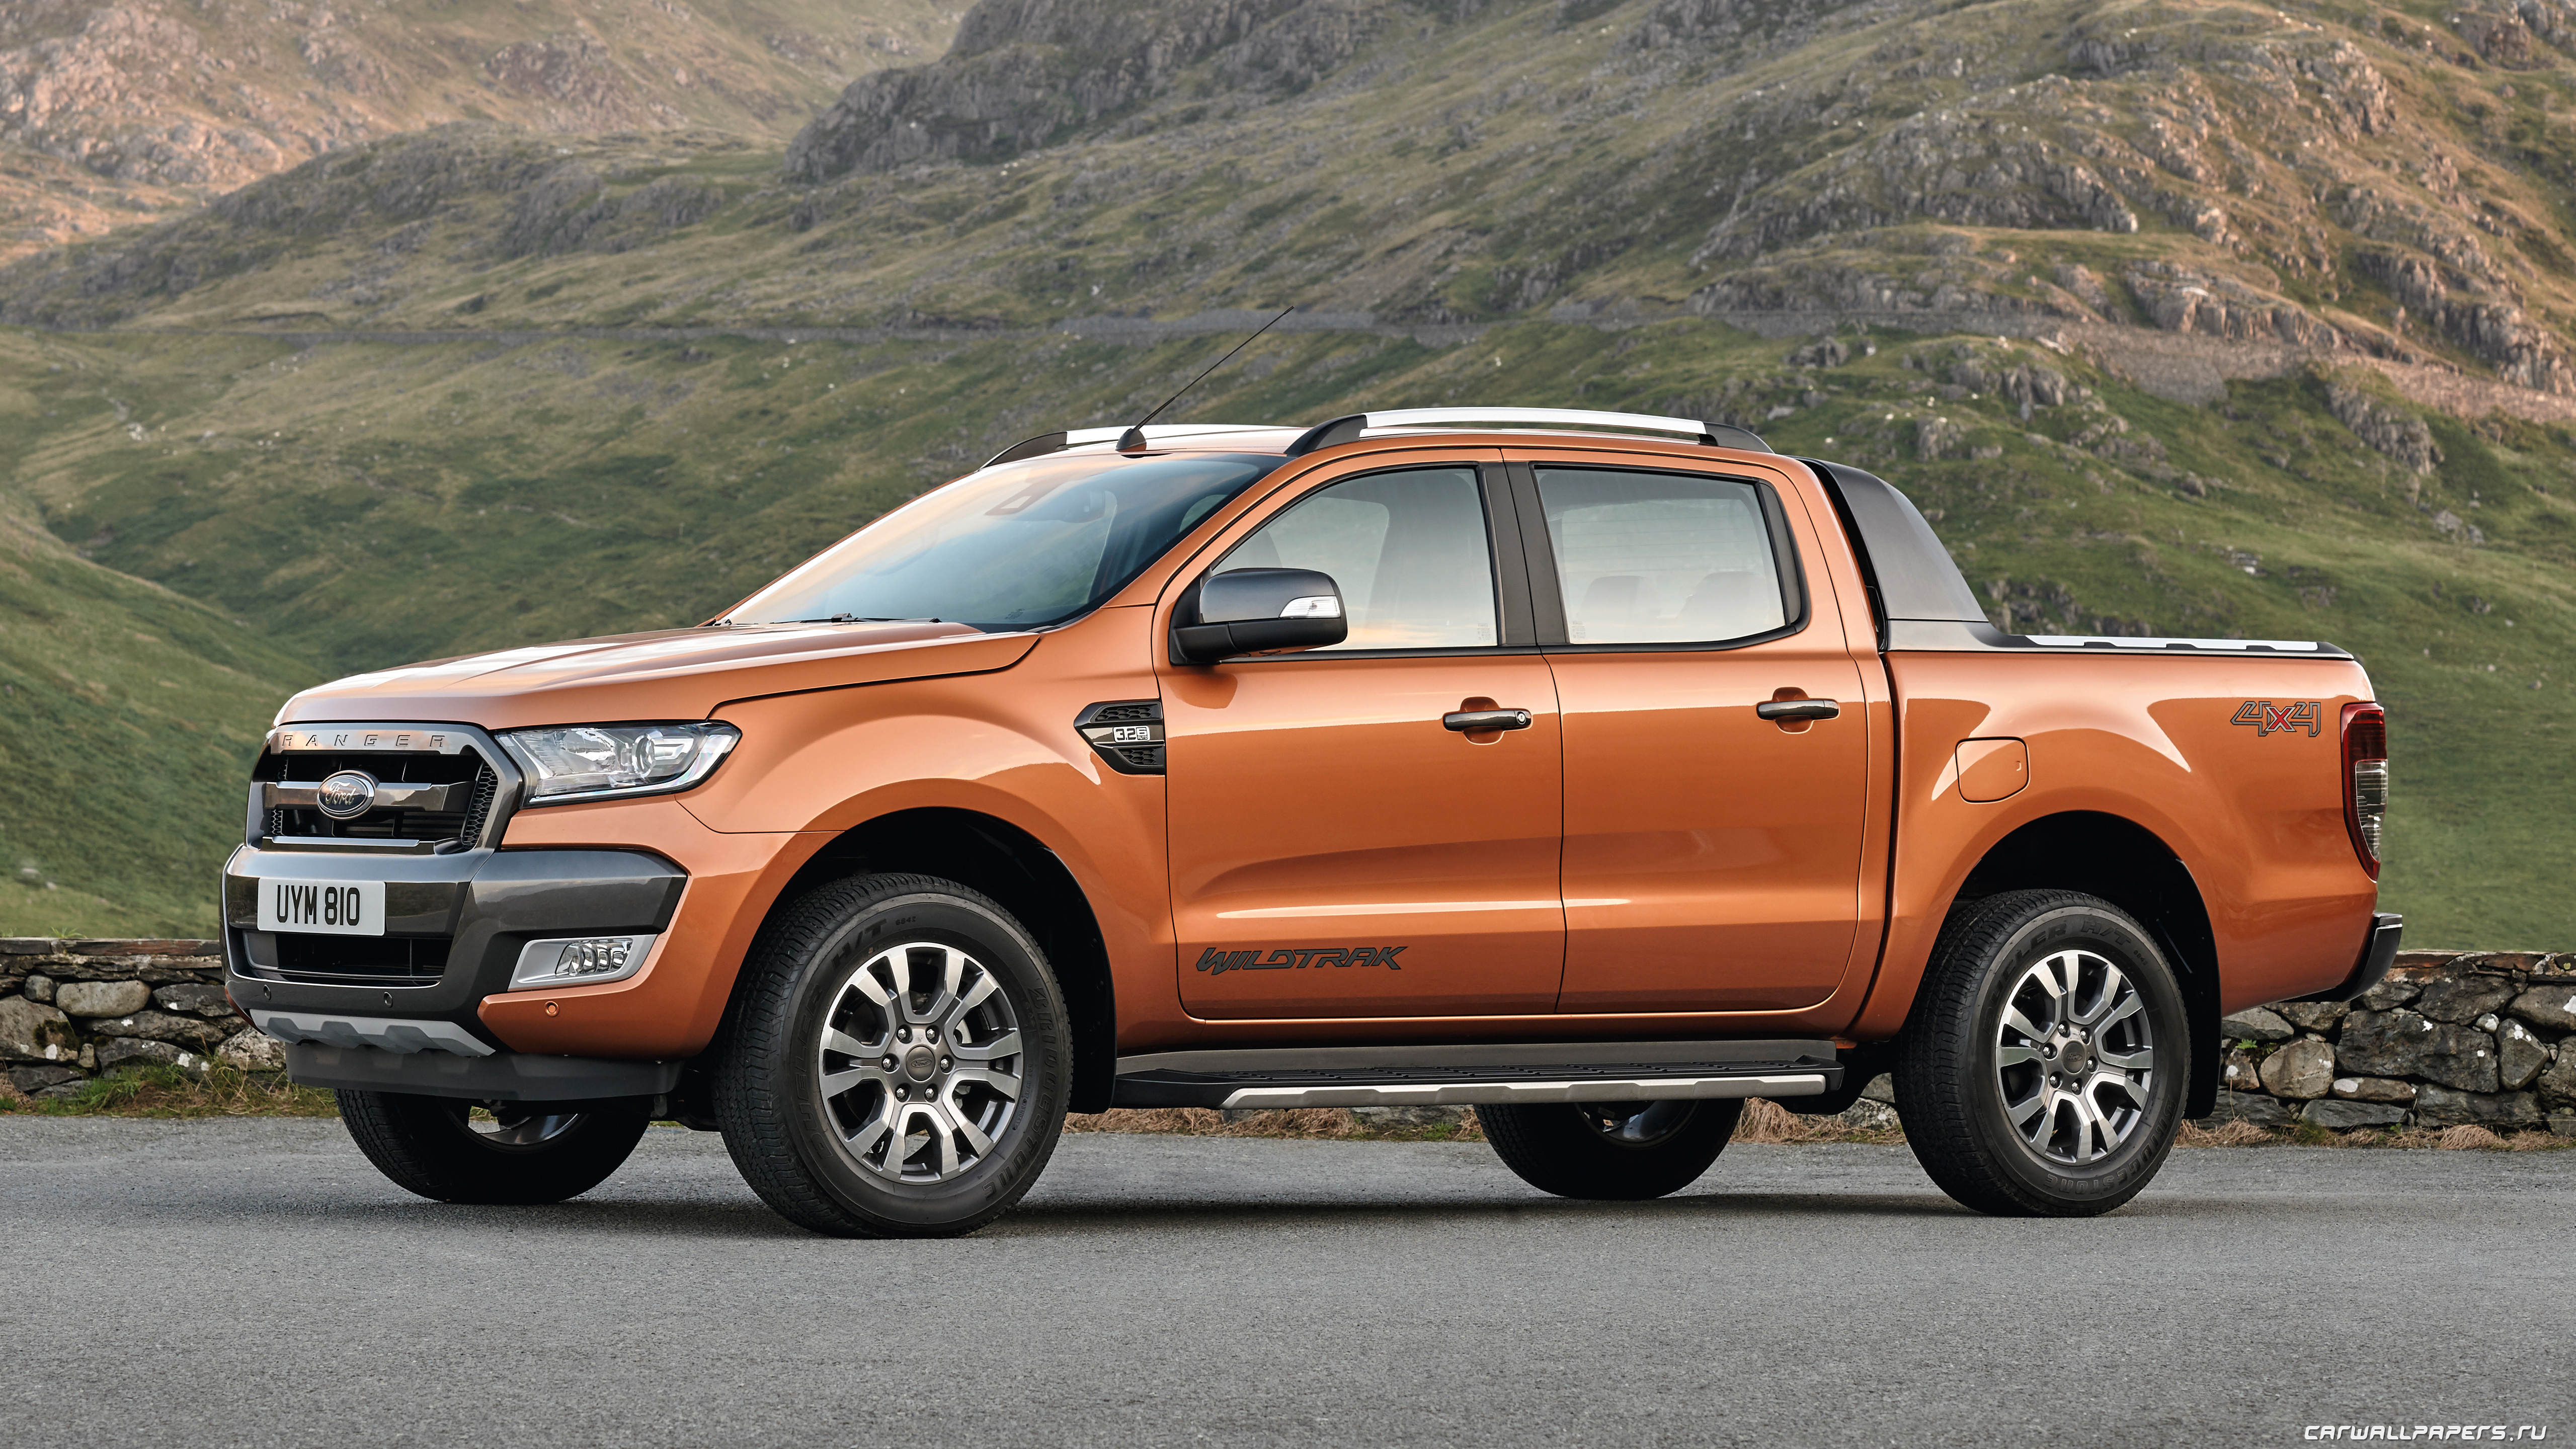 Cars Desktop Wallpapers Ford Ranger Wildtrak 2015